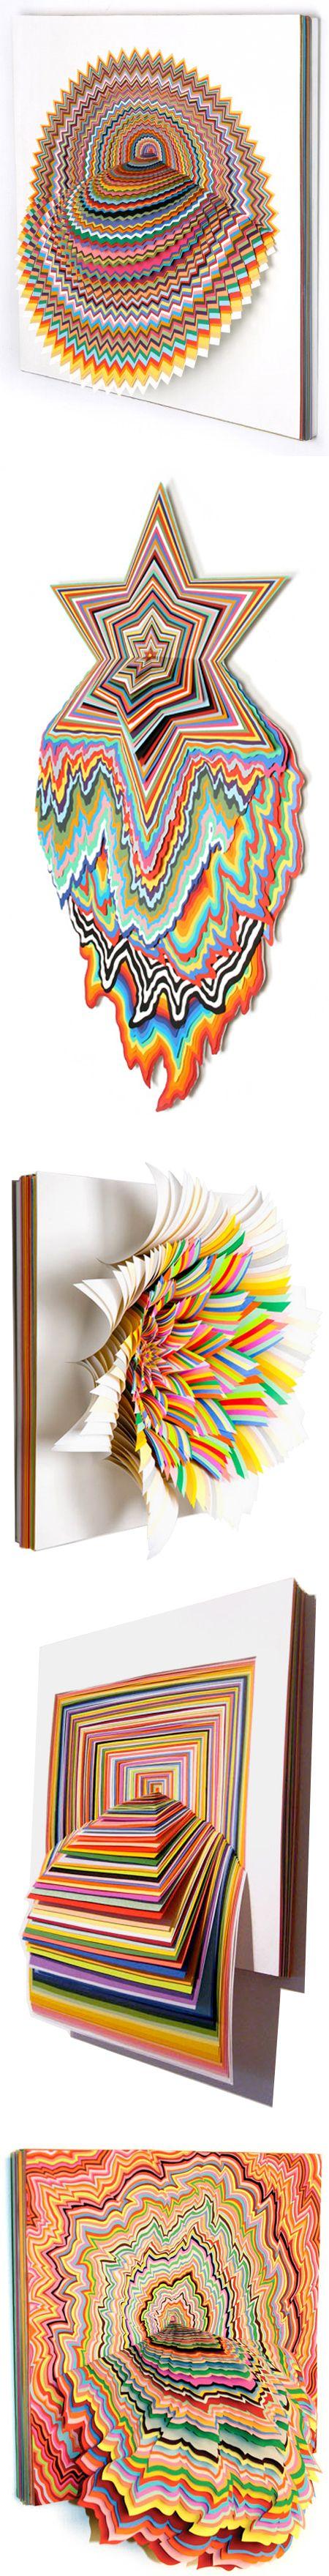 Wowsers: Jen Stark paper art: Stark Paper, Color, Jenstark, Paper Art, Paper Sculpture, Paperart, Cut Paper, A Stark, Book Projects